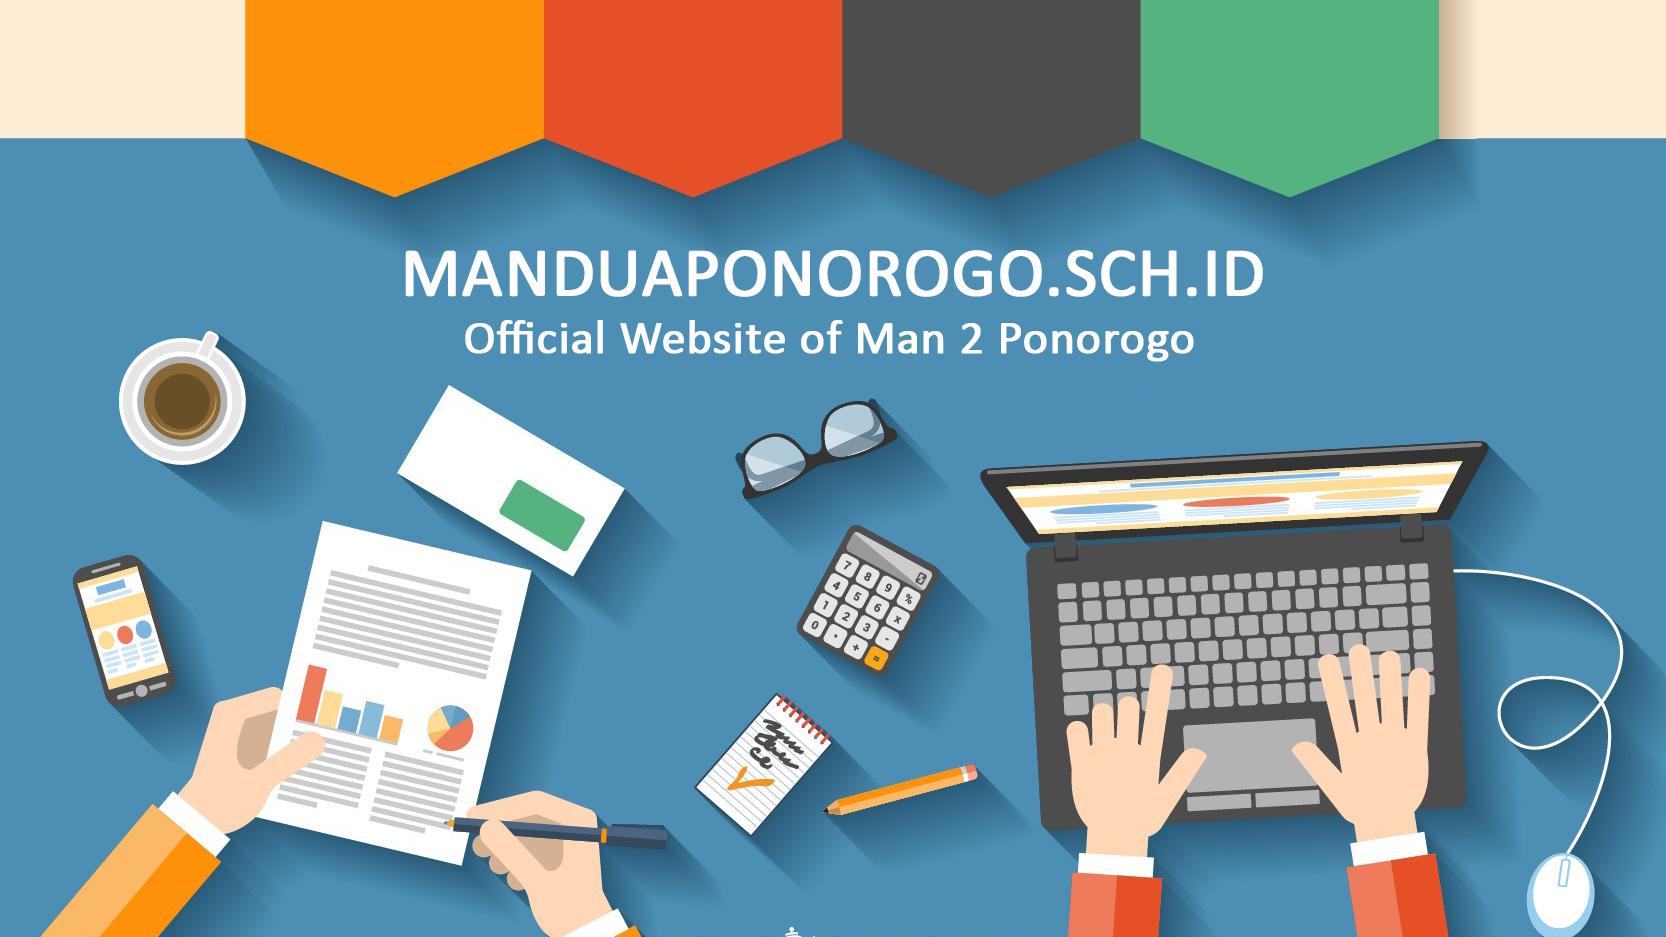 Mandapo Web Divison